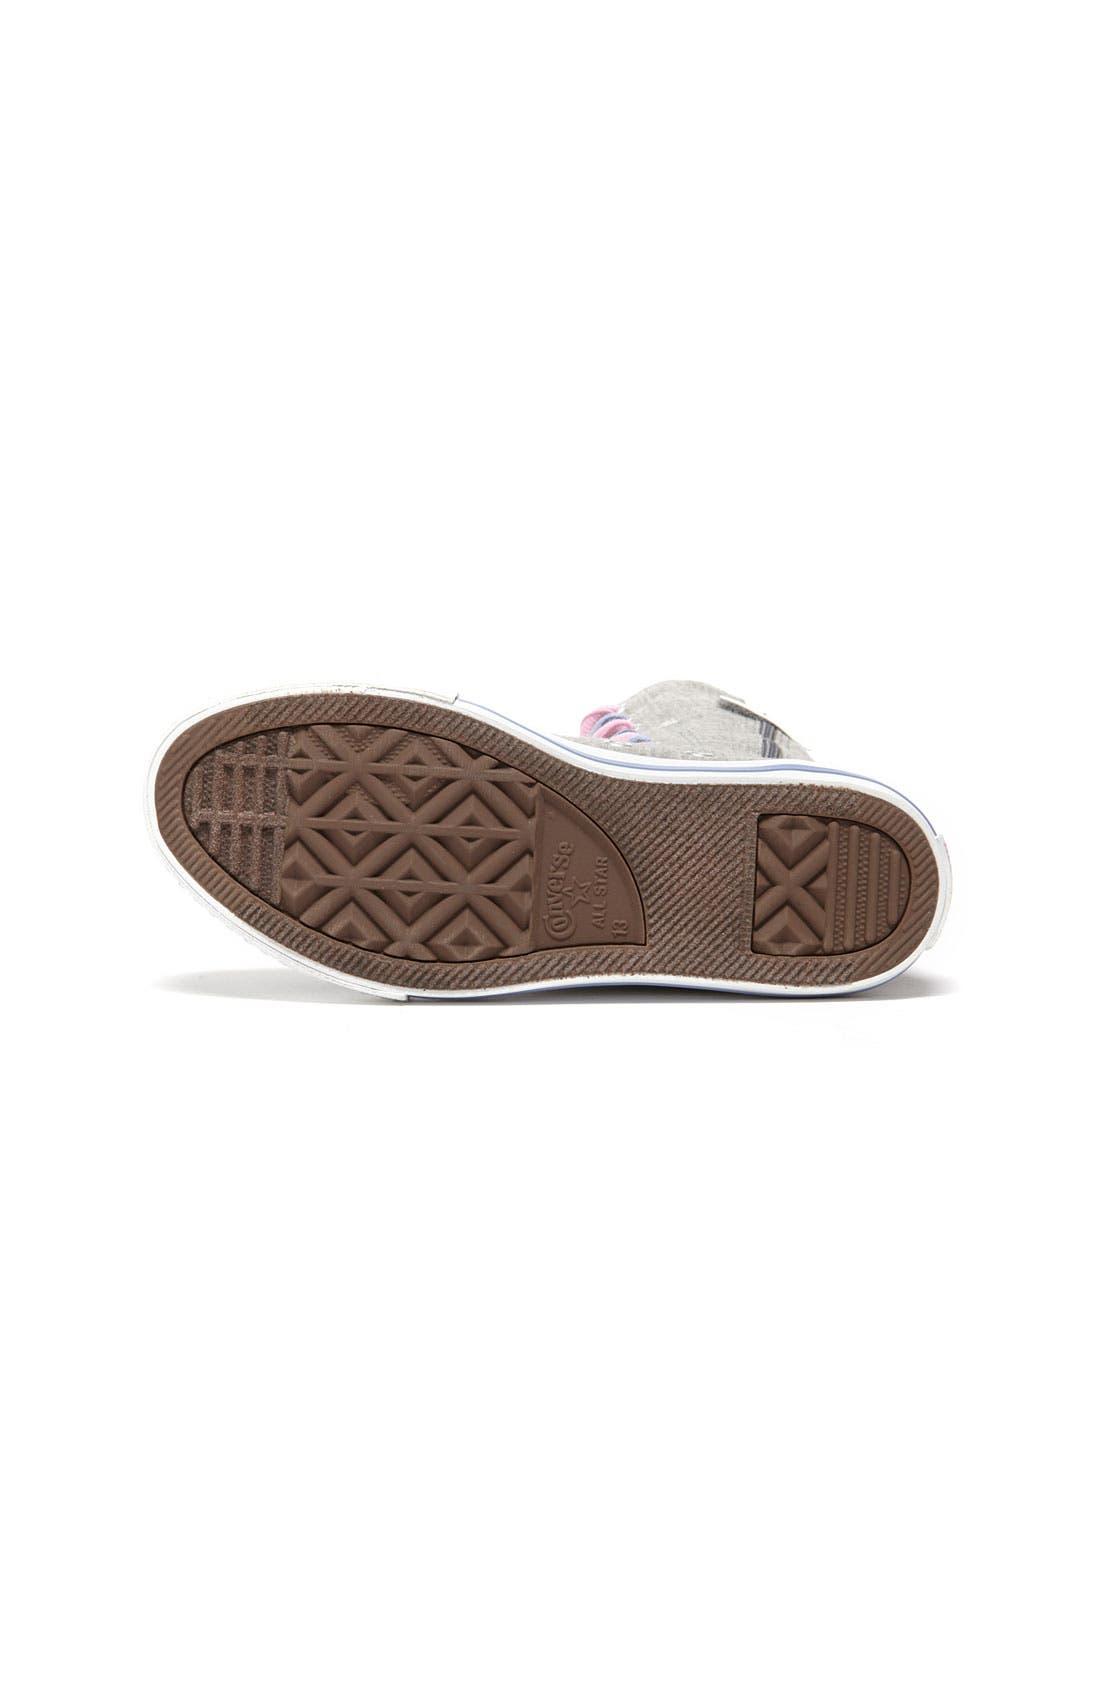 'CT X-Hi' Tall Sneaker,                             Alternate thumbnail 3, color,                             020